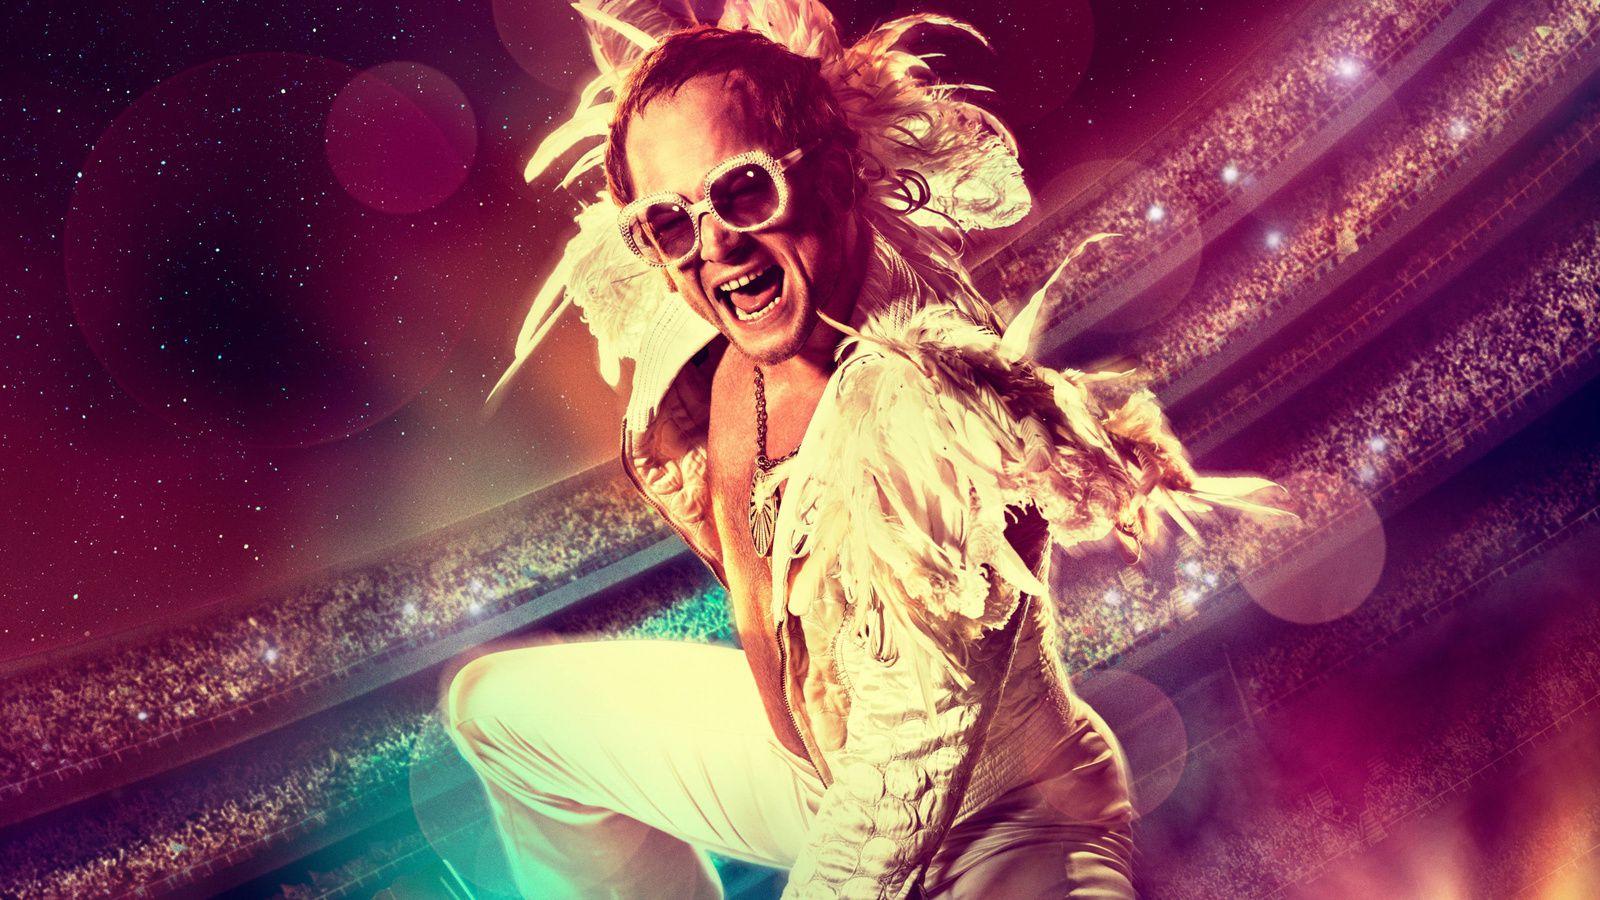 [Critique] Rocketman... un film qui a les défauts de son genre